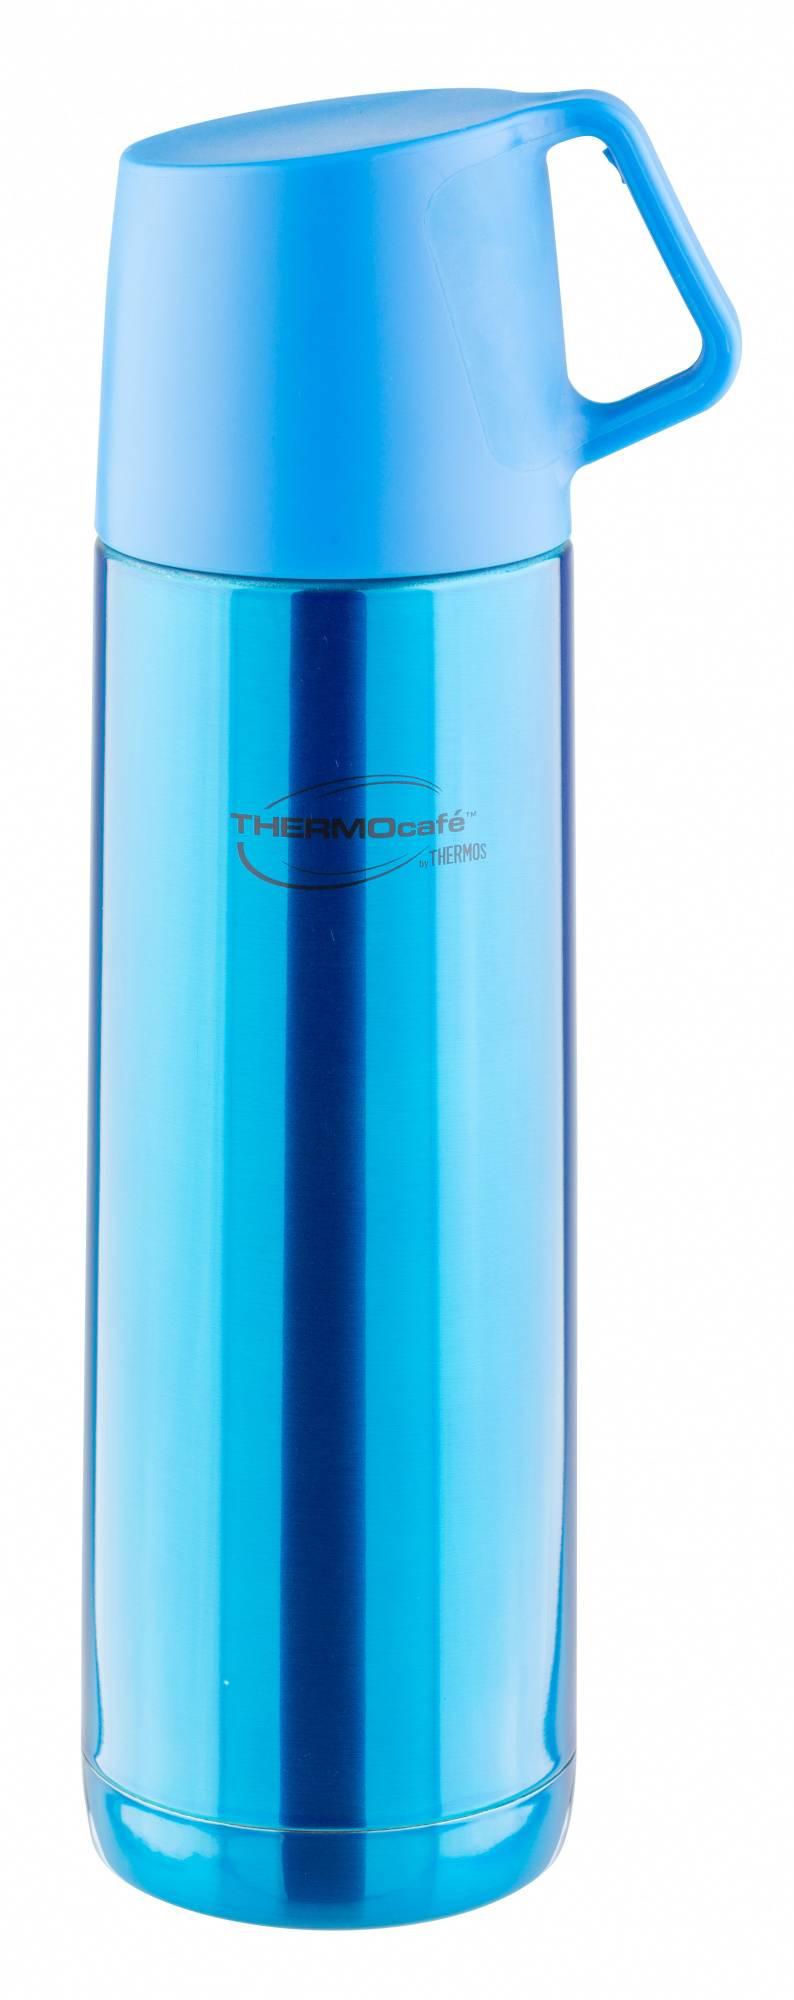 Термос Thermos THERMOcafe JF-50 синий - фото 1